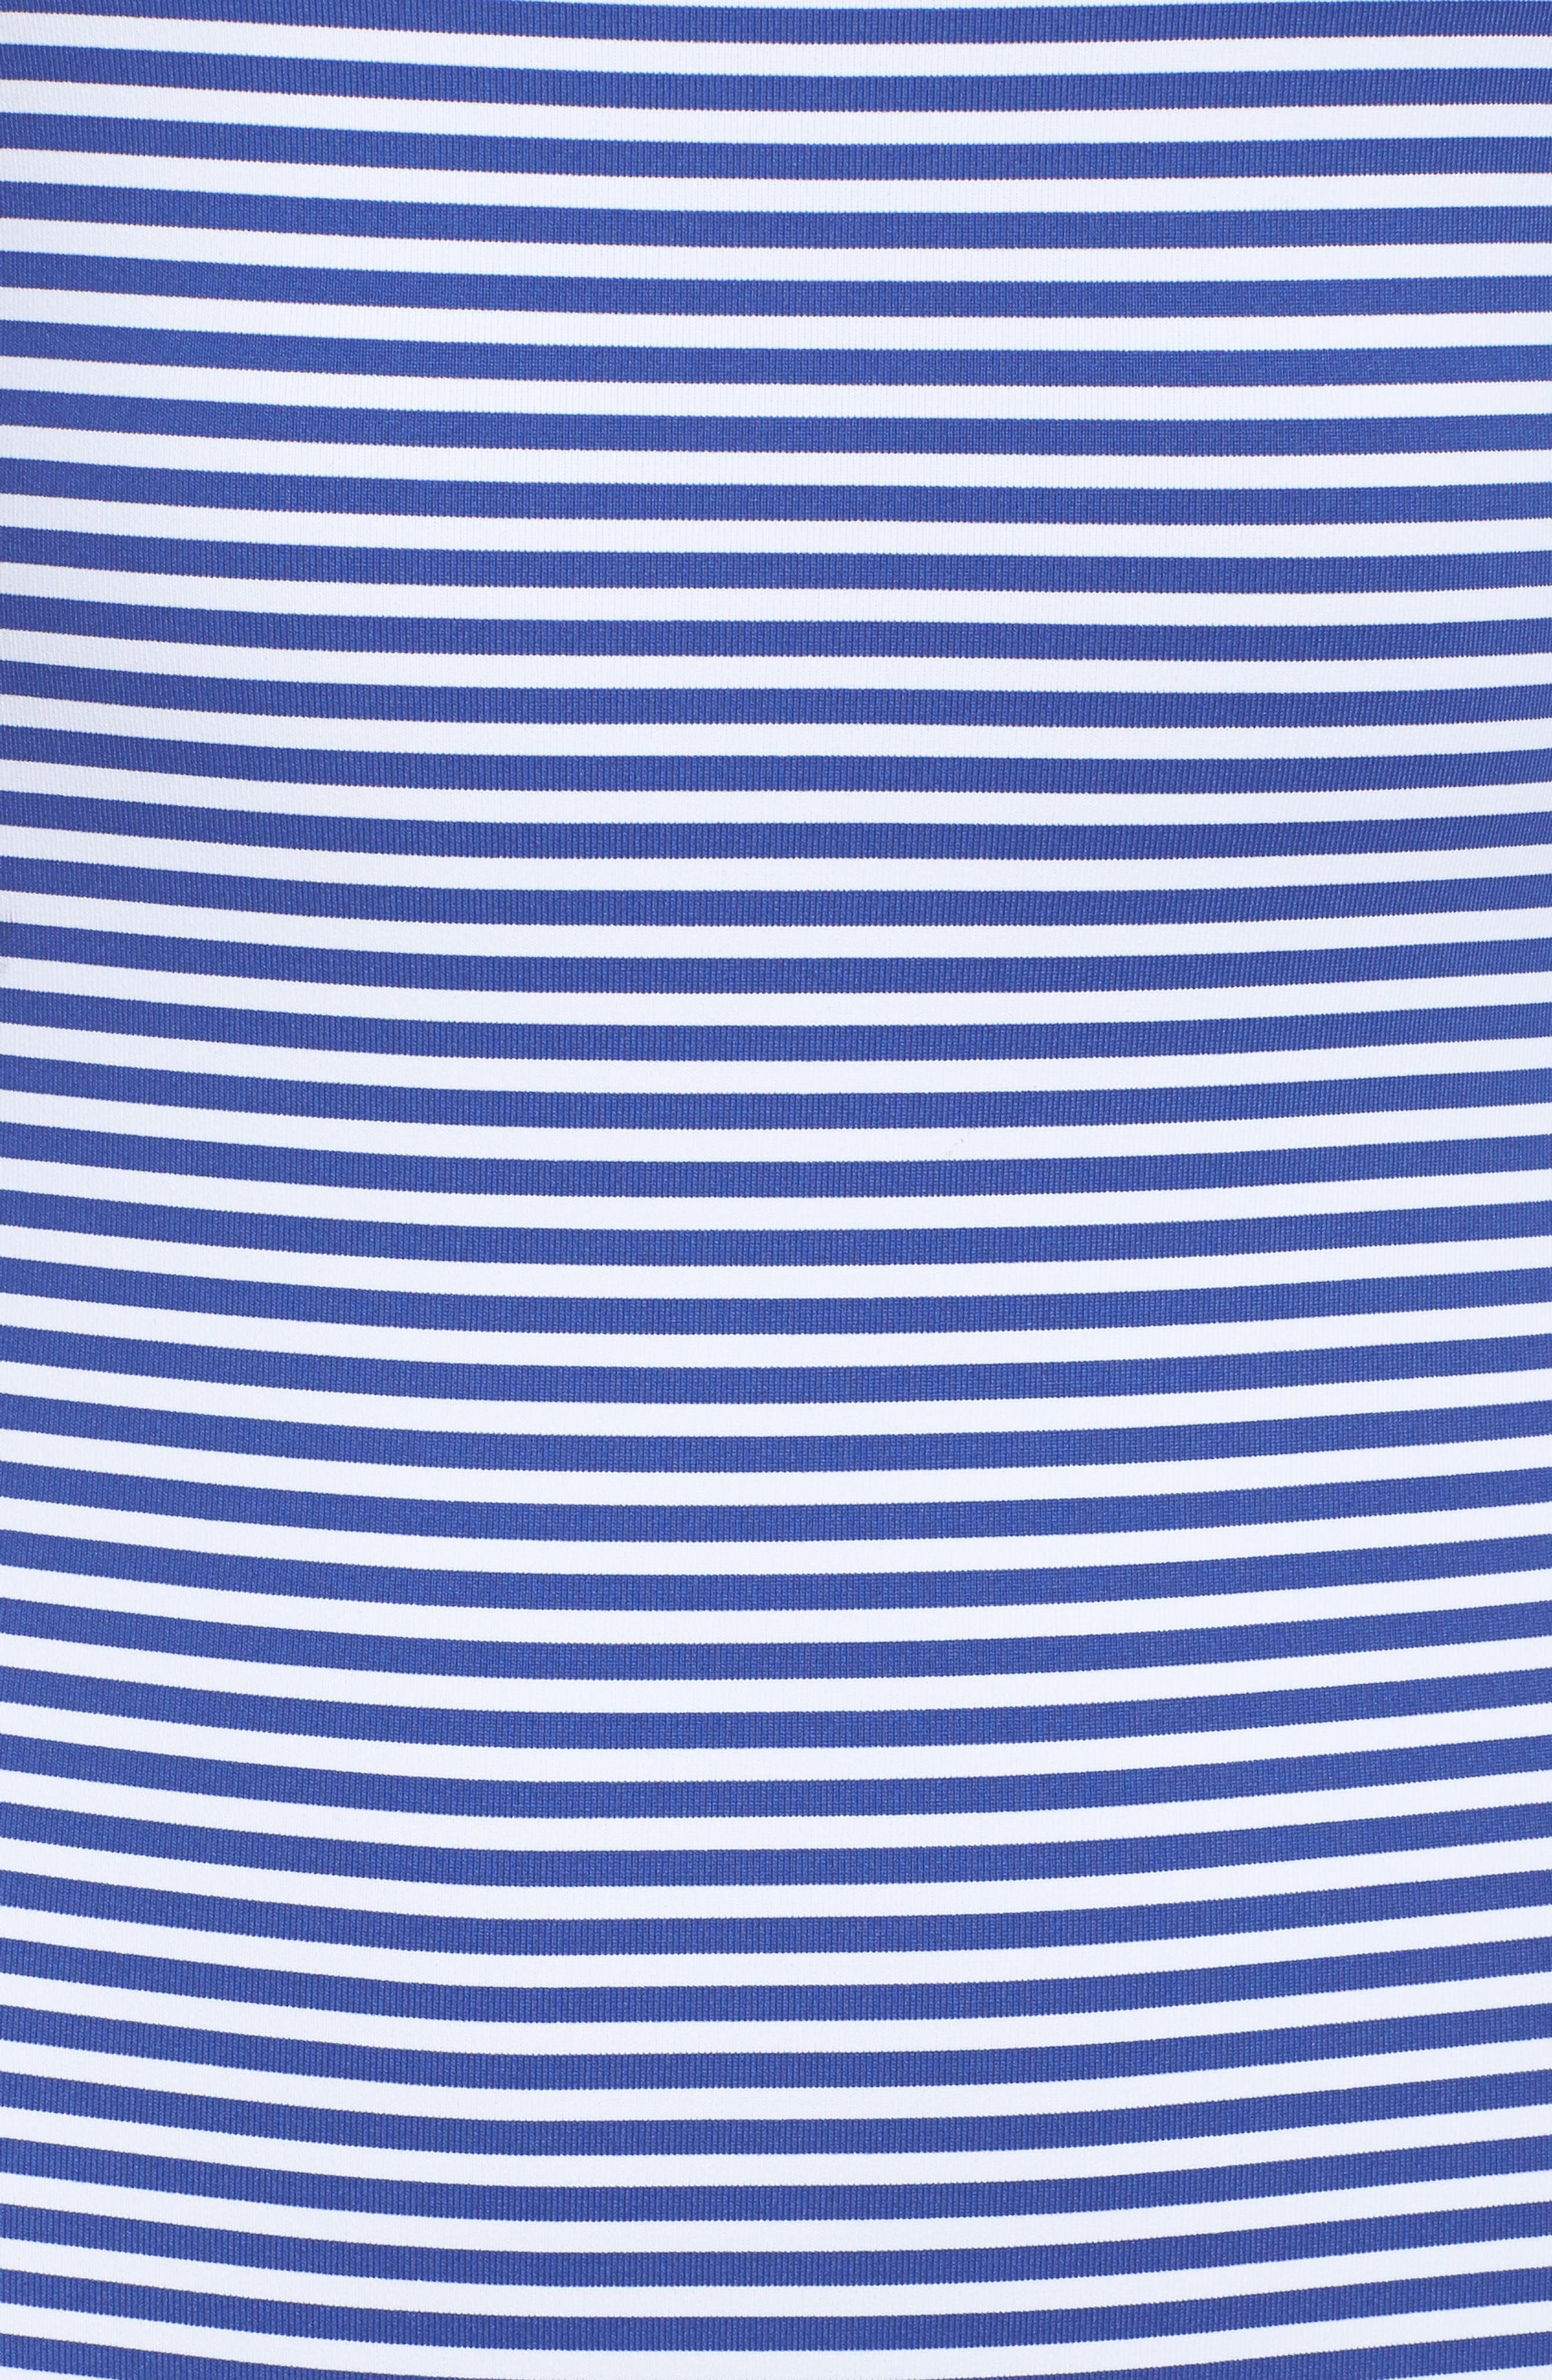 TOMMY BAHAMA, Reversible One-Piece Swimsuit, Alternate thumbnail 6, color, DARK SANIBEL